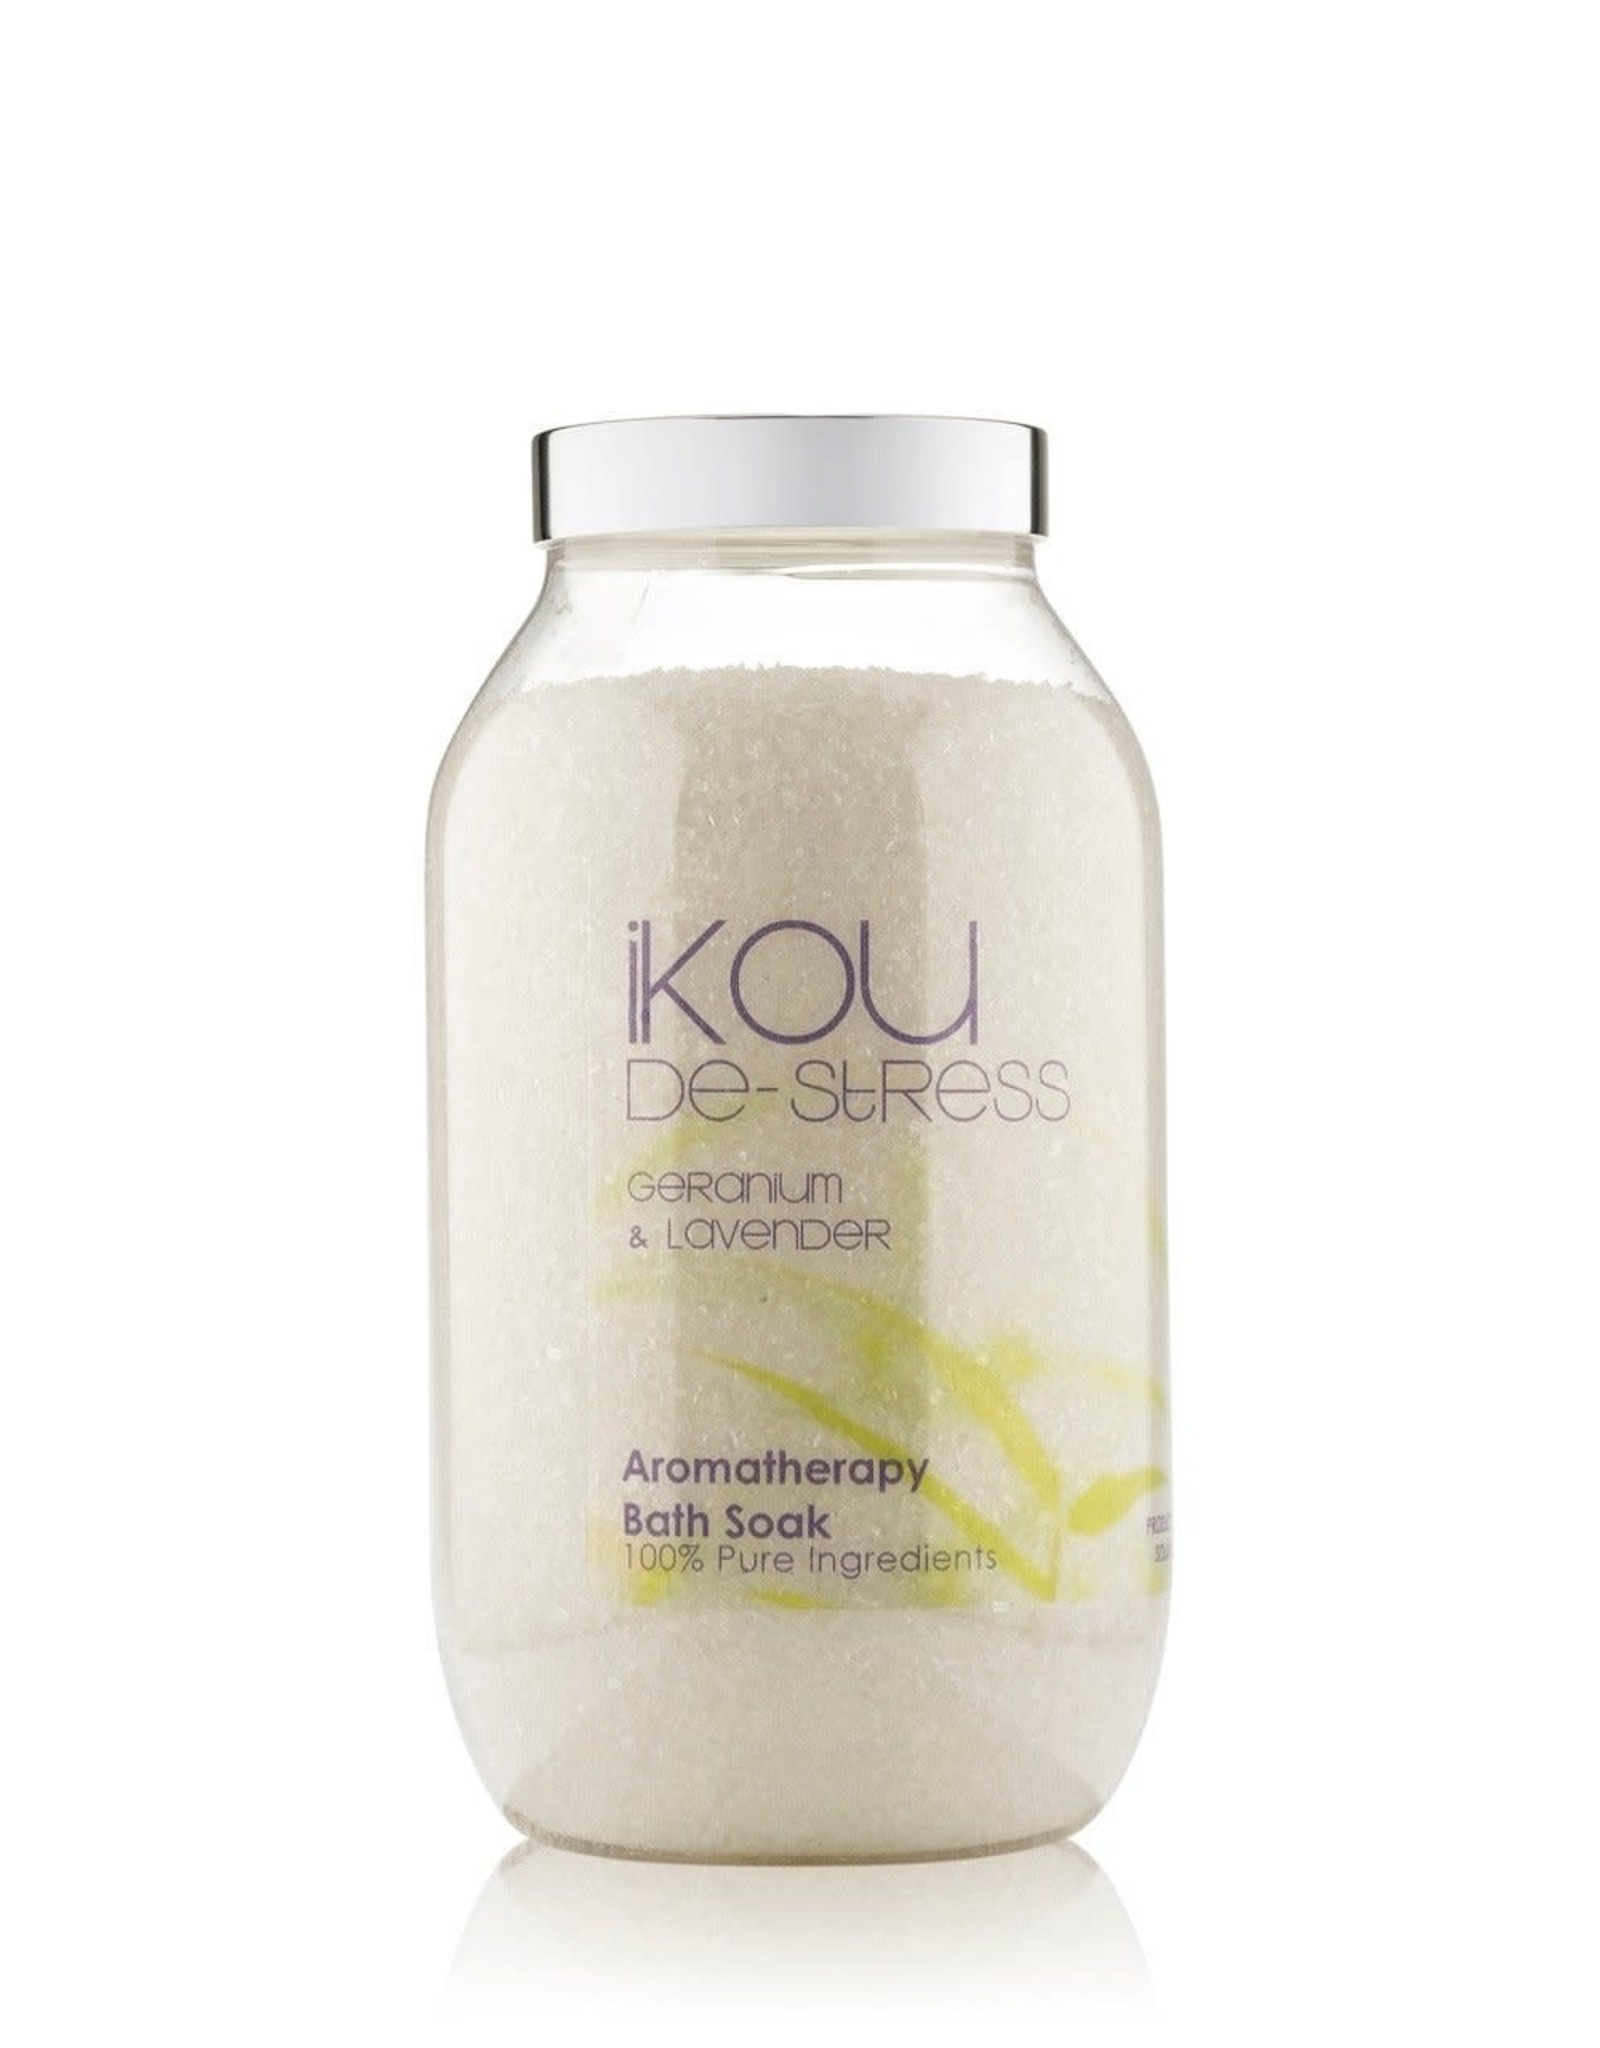 IKOU Bath Soak De-stress (850g)